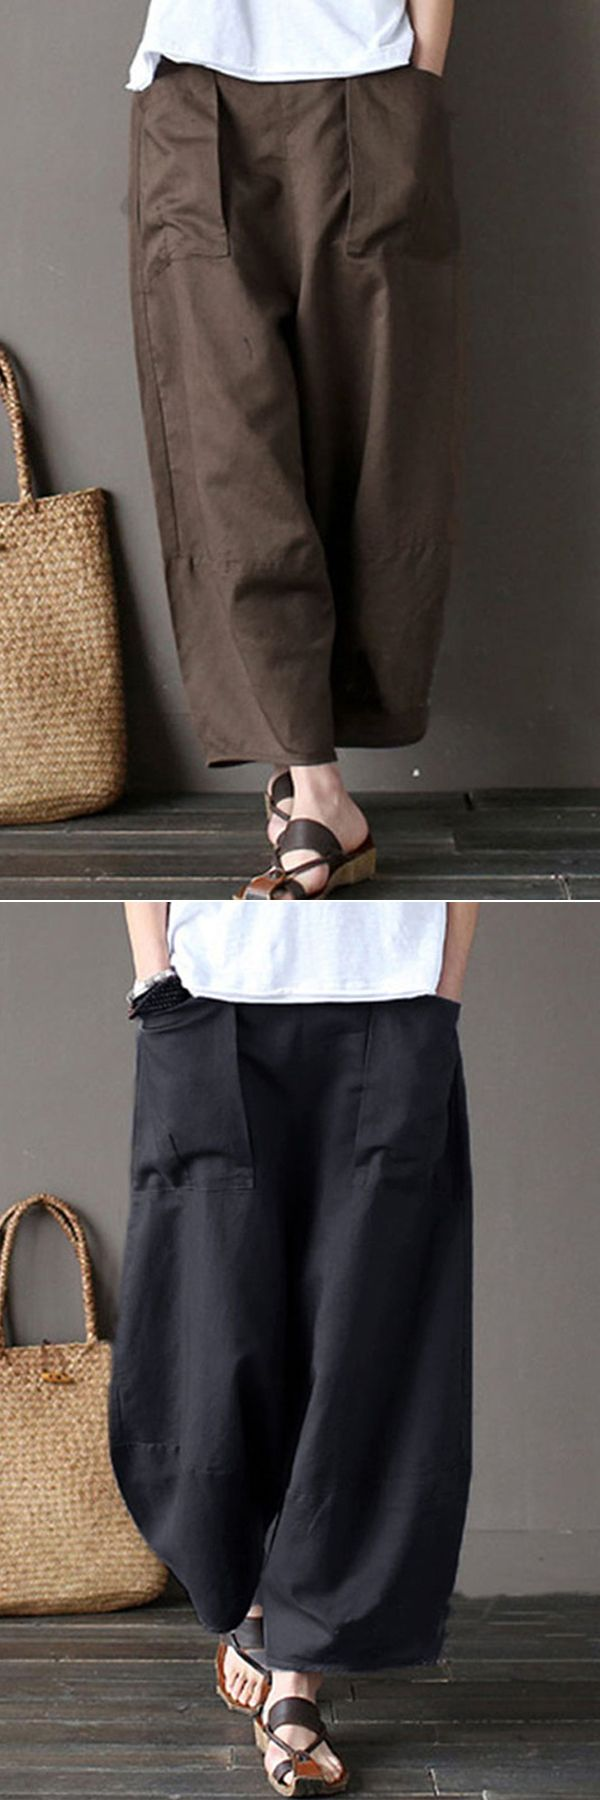 [Newchic Online Shopping] 47%OFF Gracila Casual Pants | Pure Color Pants | Wide Leg Pants | Elastic Waist Pants | Pants for Women #pants #womensfashion #winterfashion